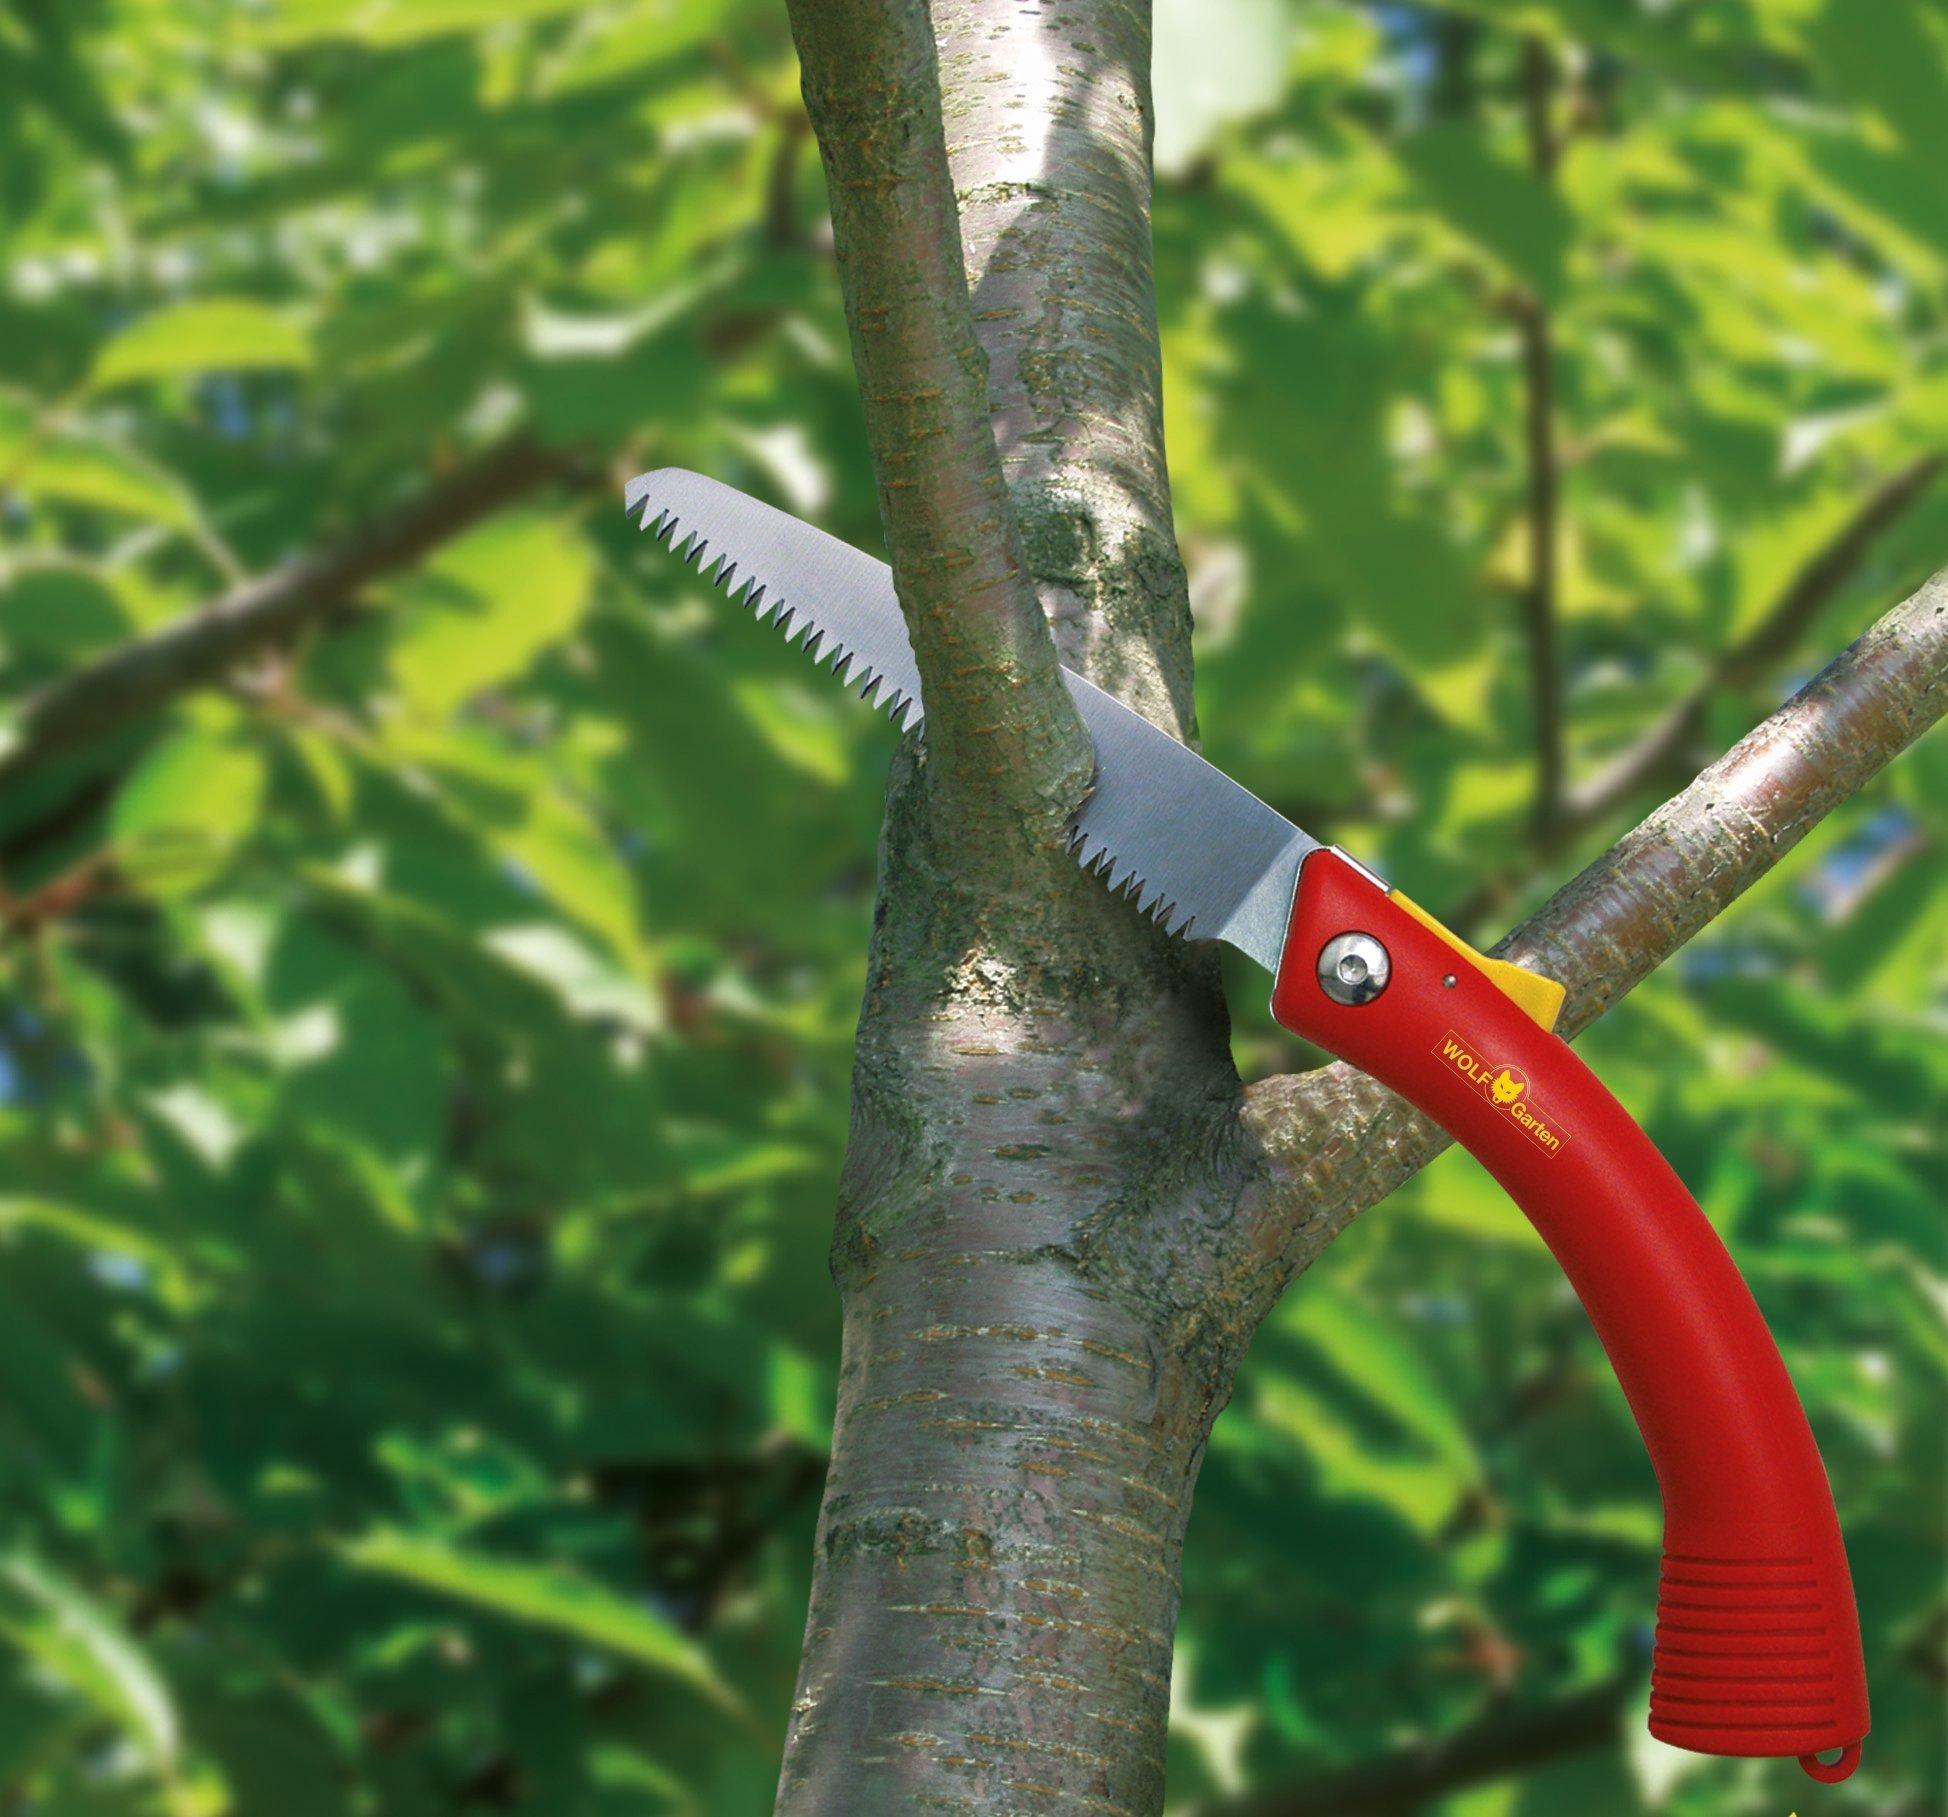 Wolf-Garten REK Folding Pruning Saw by Wolf-Garten